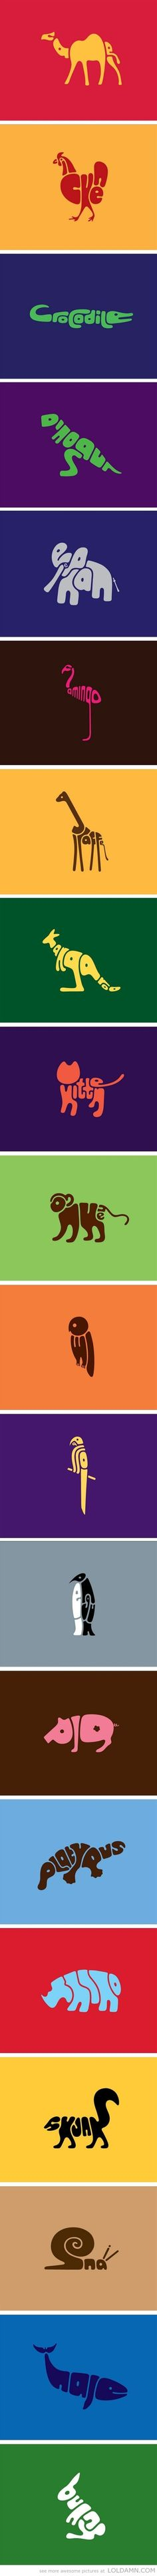 Word Animals